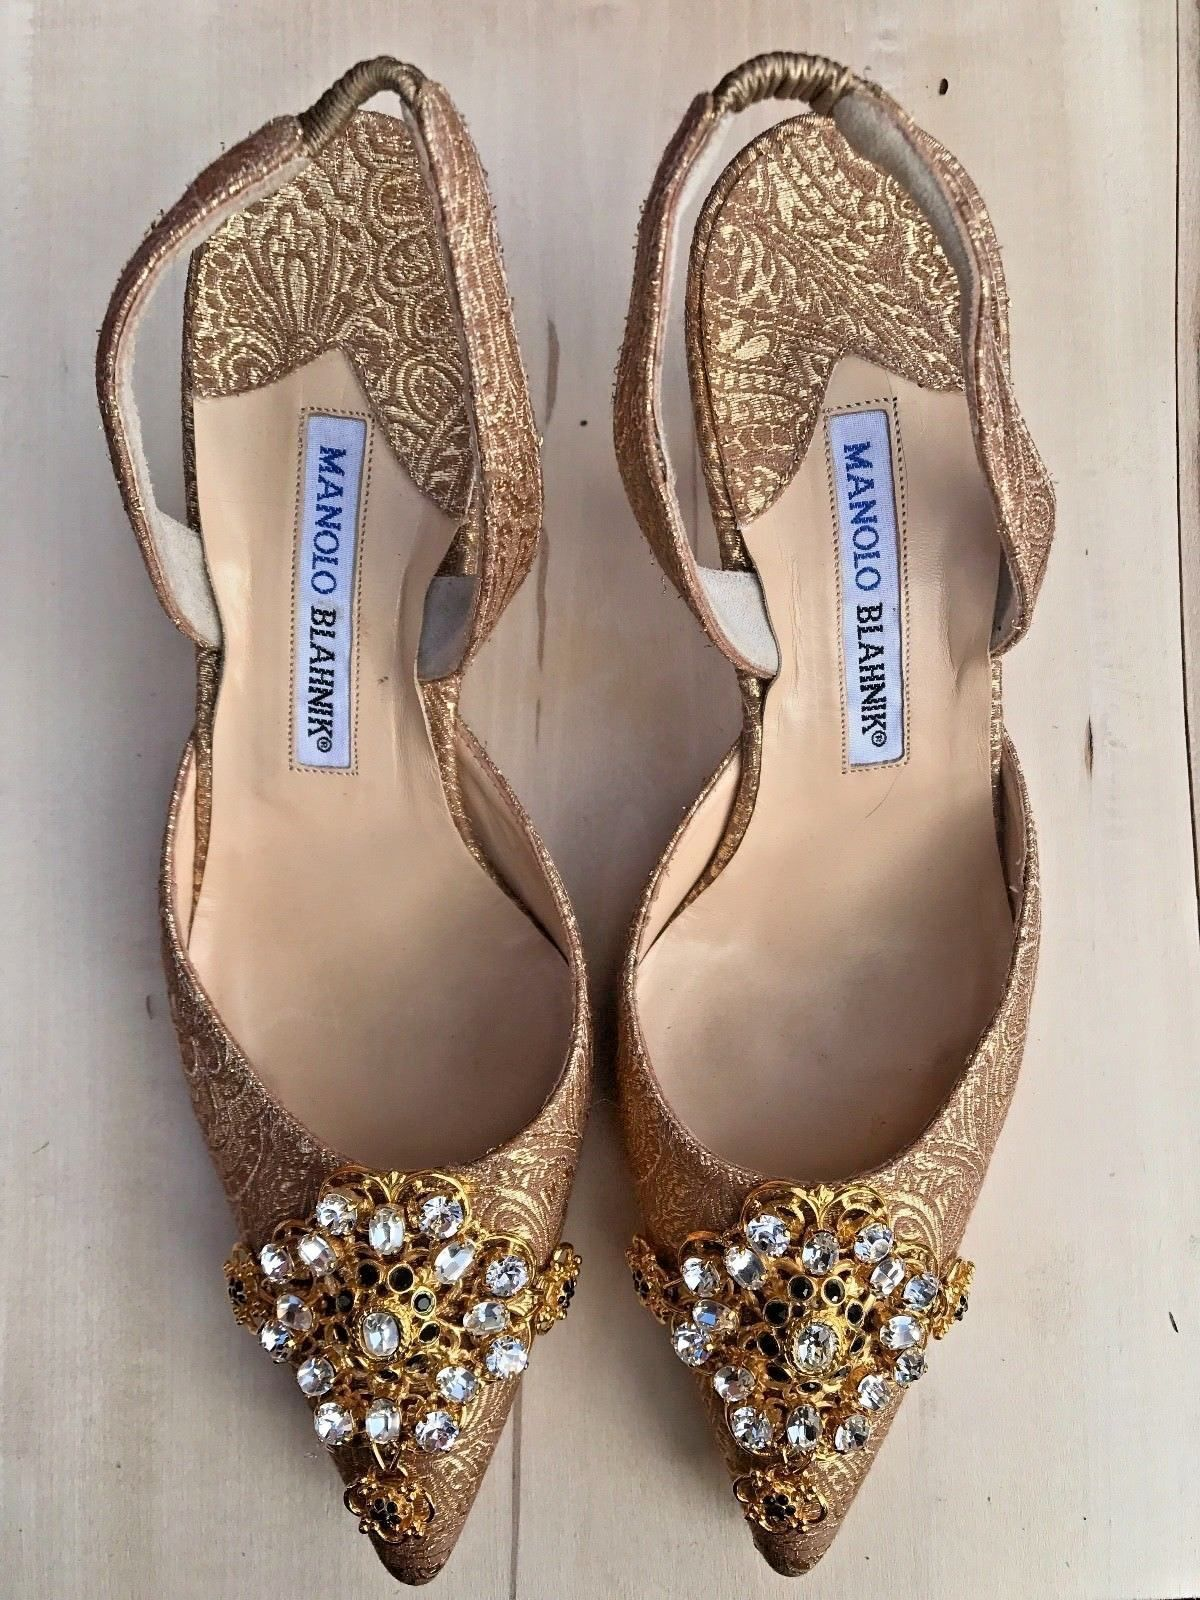 Manolo Blahnik 37 Exclusively Neiman Marcus Gold Jeweled Evening Shoes 745 Manolo Blahnik Heels Manolo Blahnik Heels